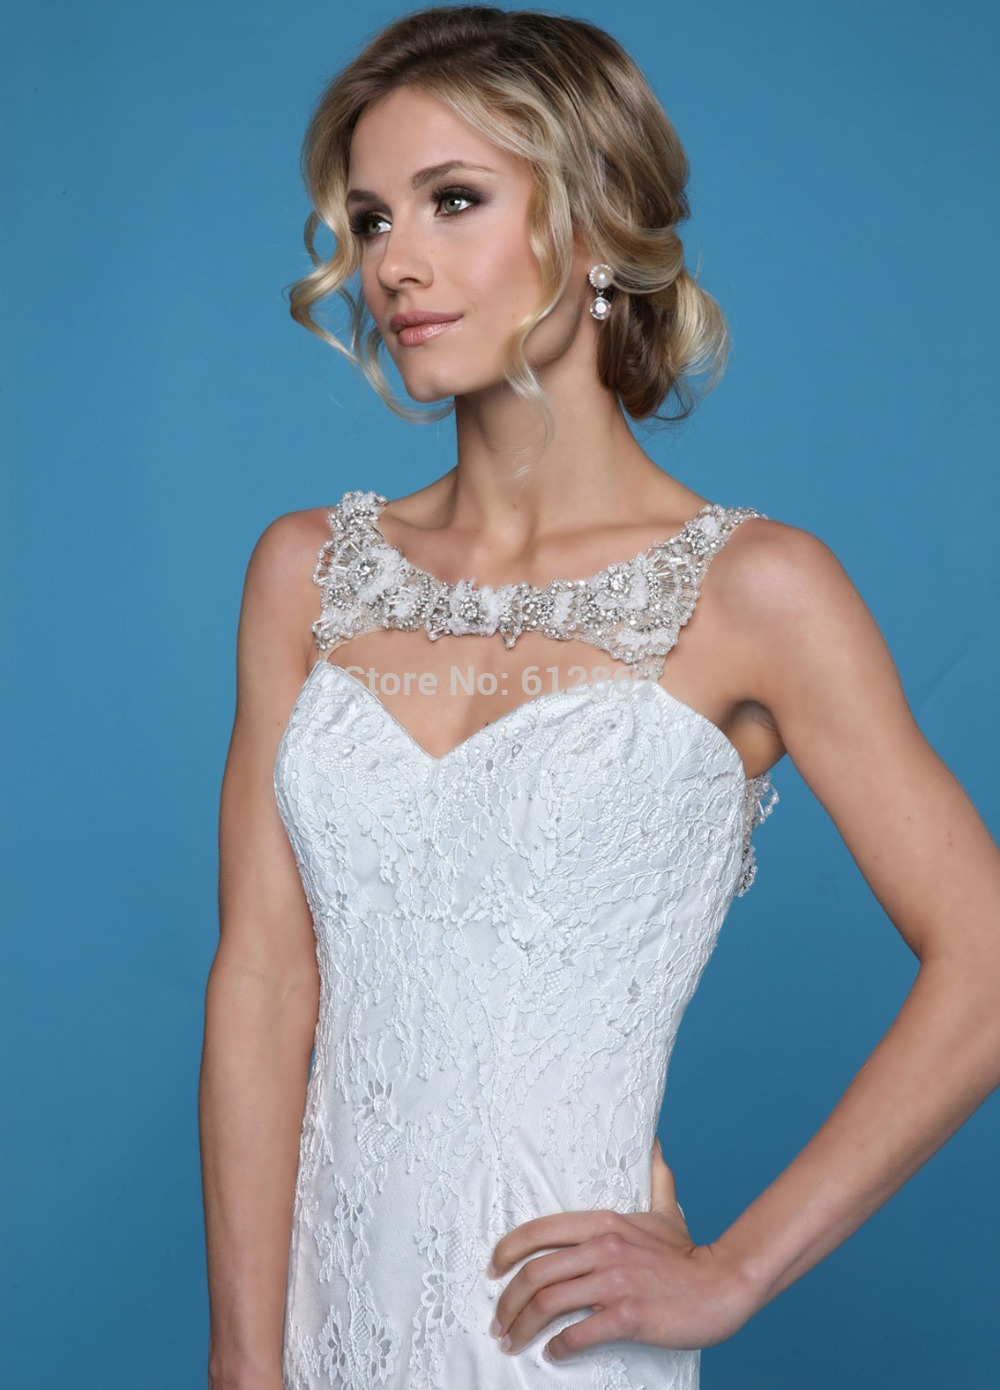 bride fashion 6 wedding dresses in la heart shaped wedding dress ICIAR mermaid wedding dress with heart shaped cleavage and straps La Sposa